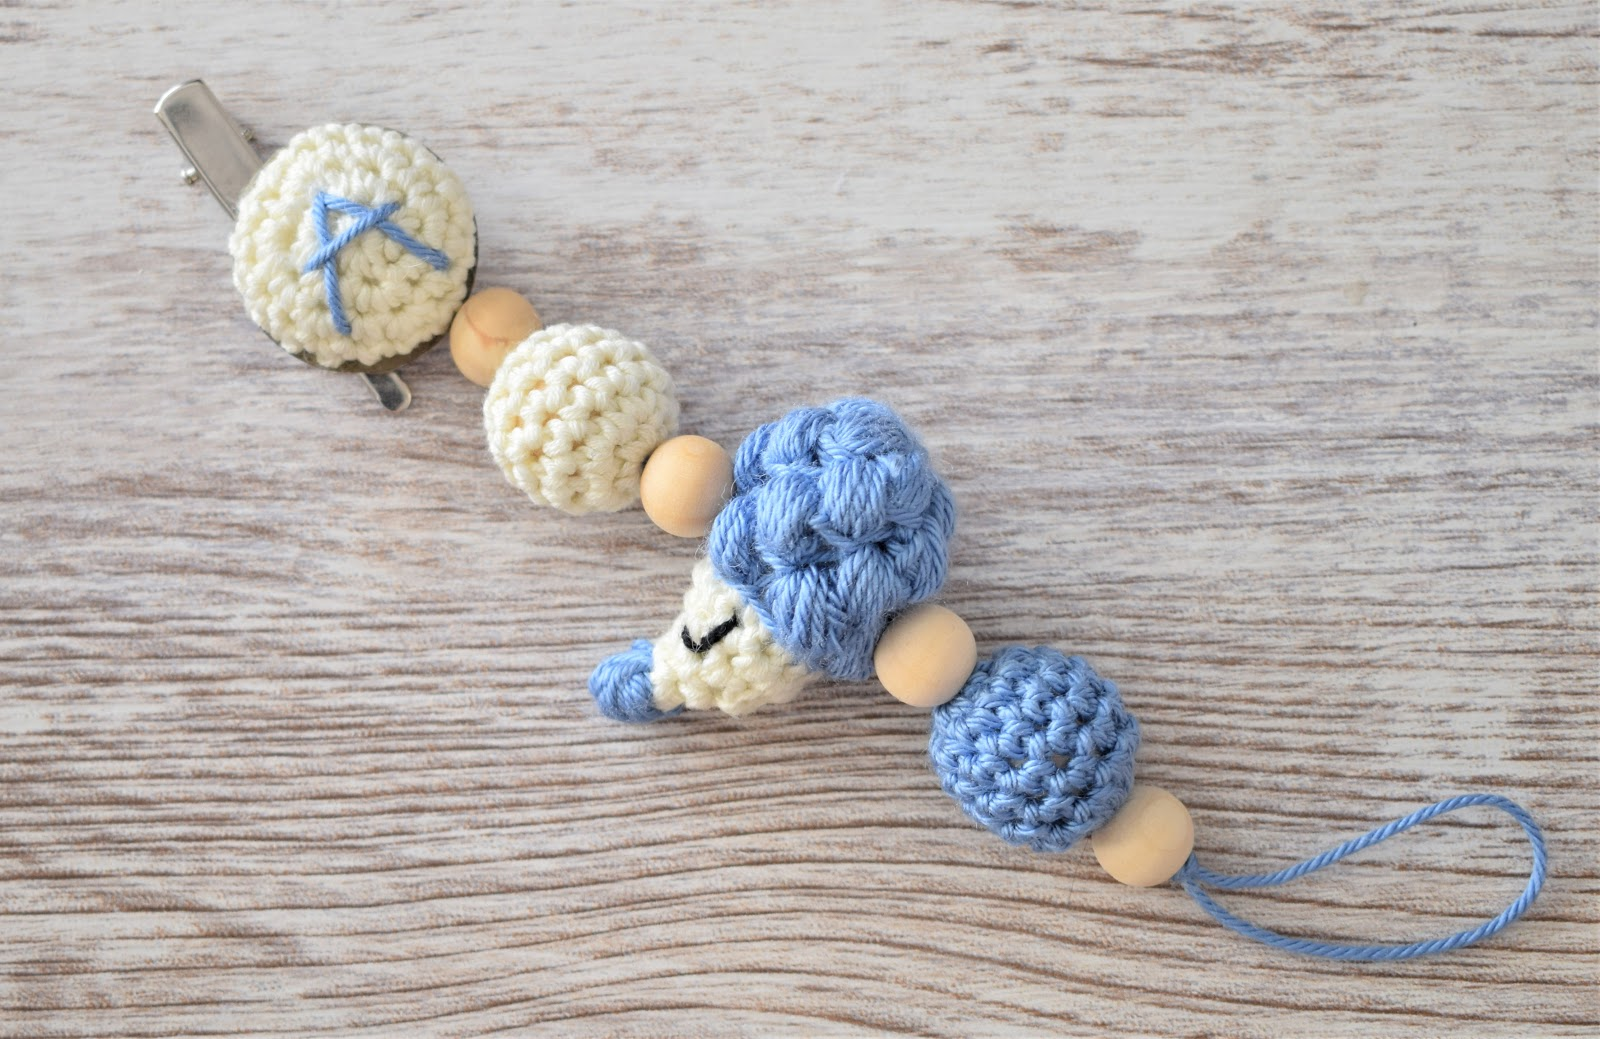 Patrón libre de ganchillo erizo | Crochet puntada de la bruja ... | 1039x1600